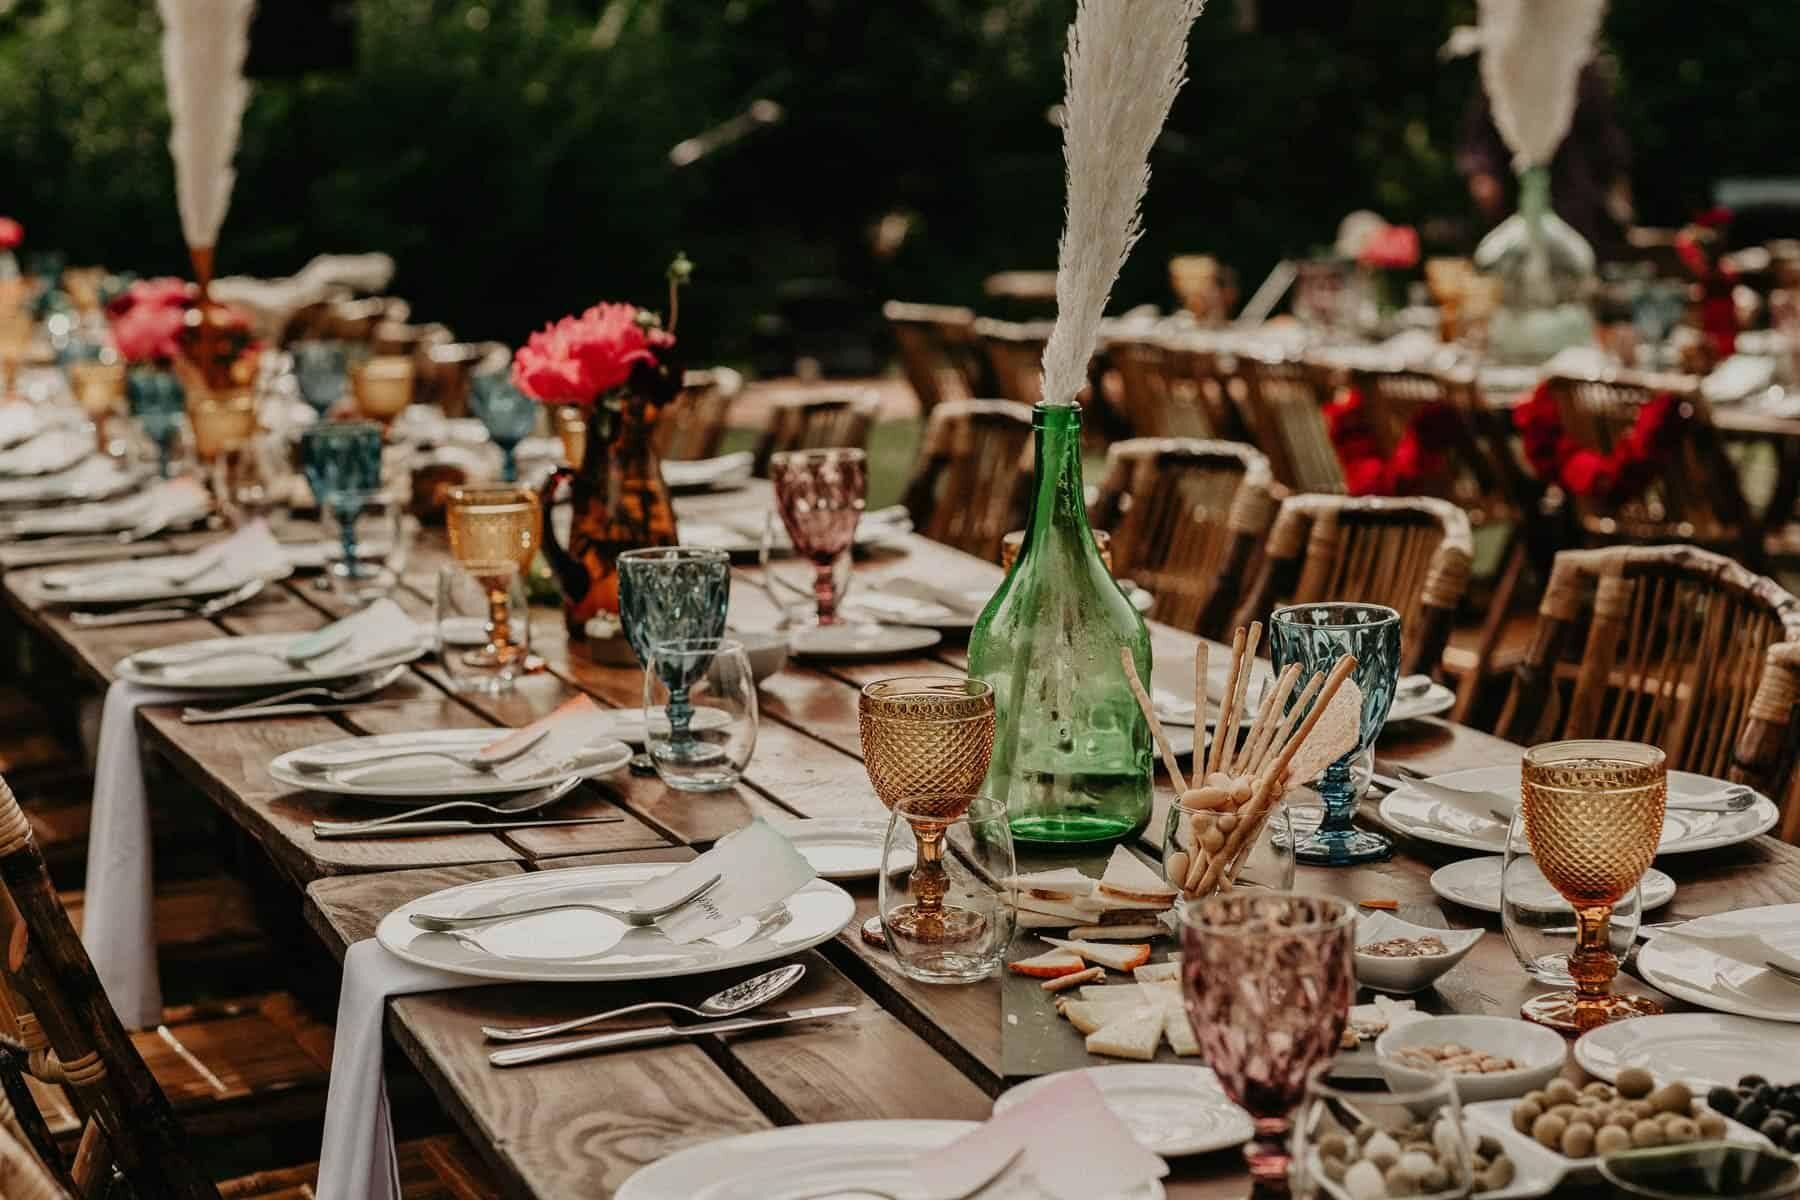 vibrant outdoor tablescape with colour glassware